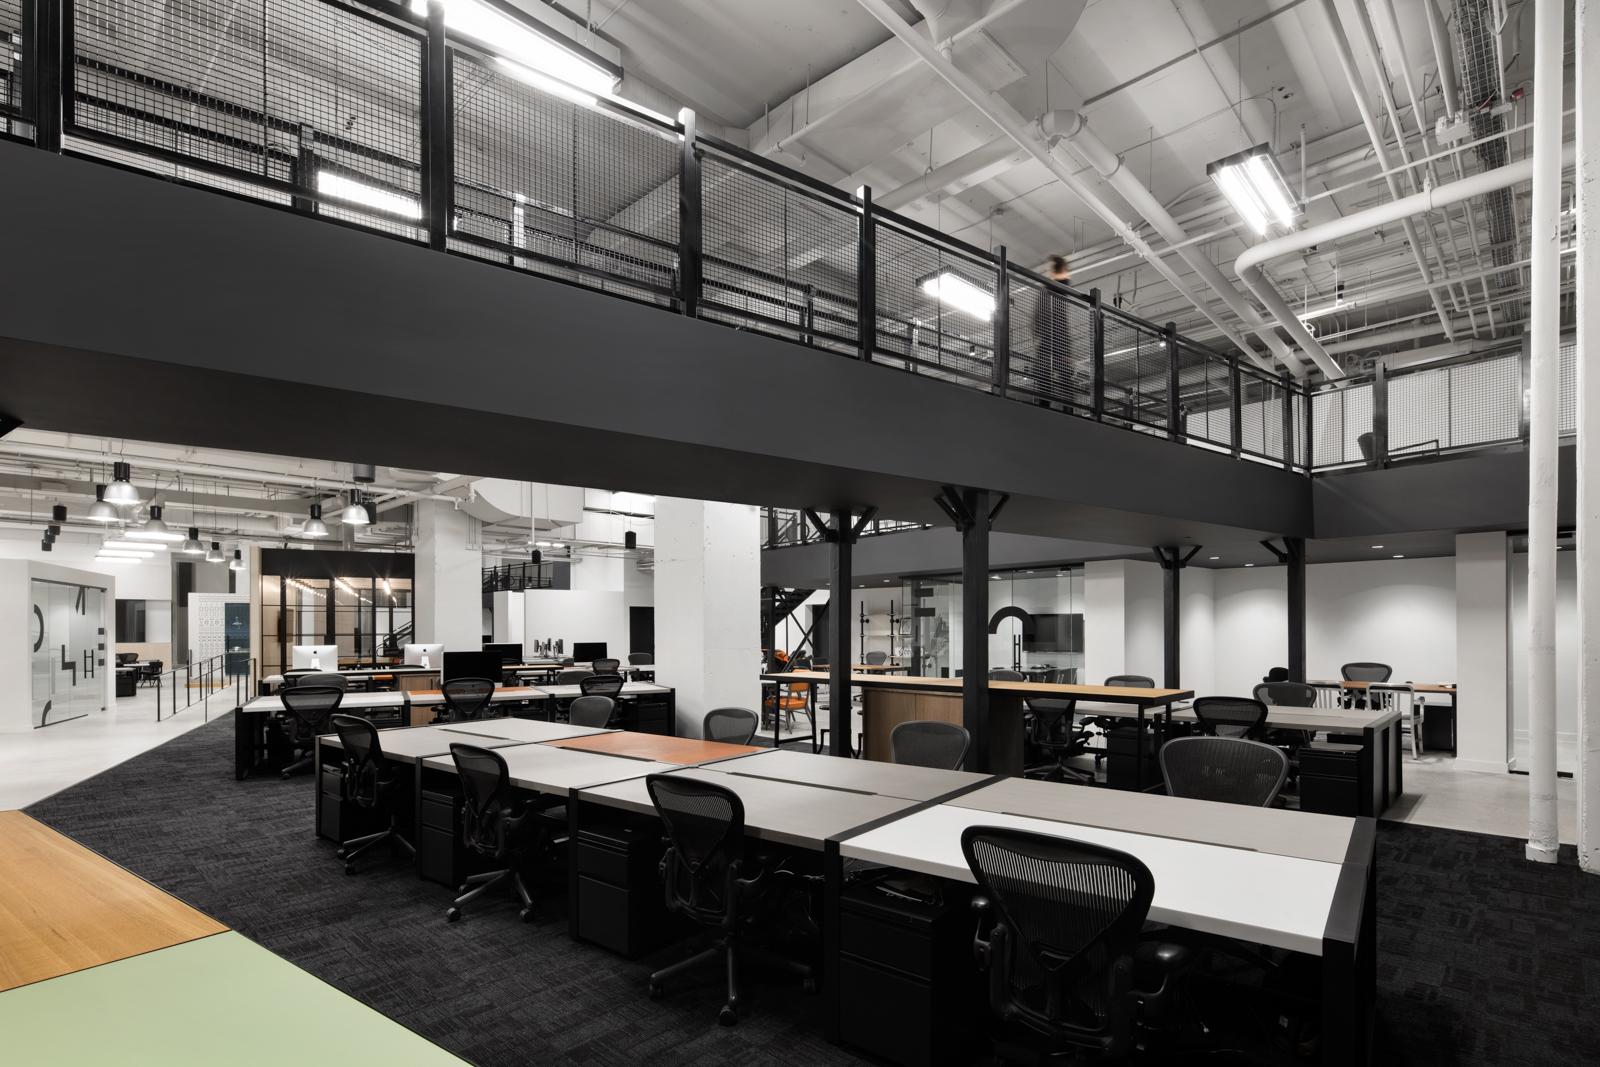 OM-22_Mezzanines+Desks_SM.jpg